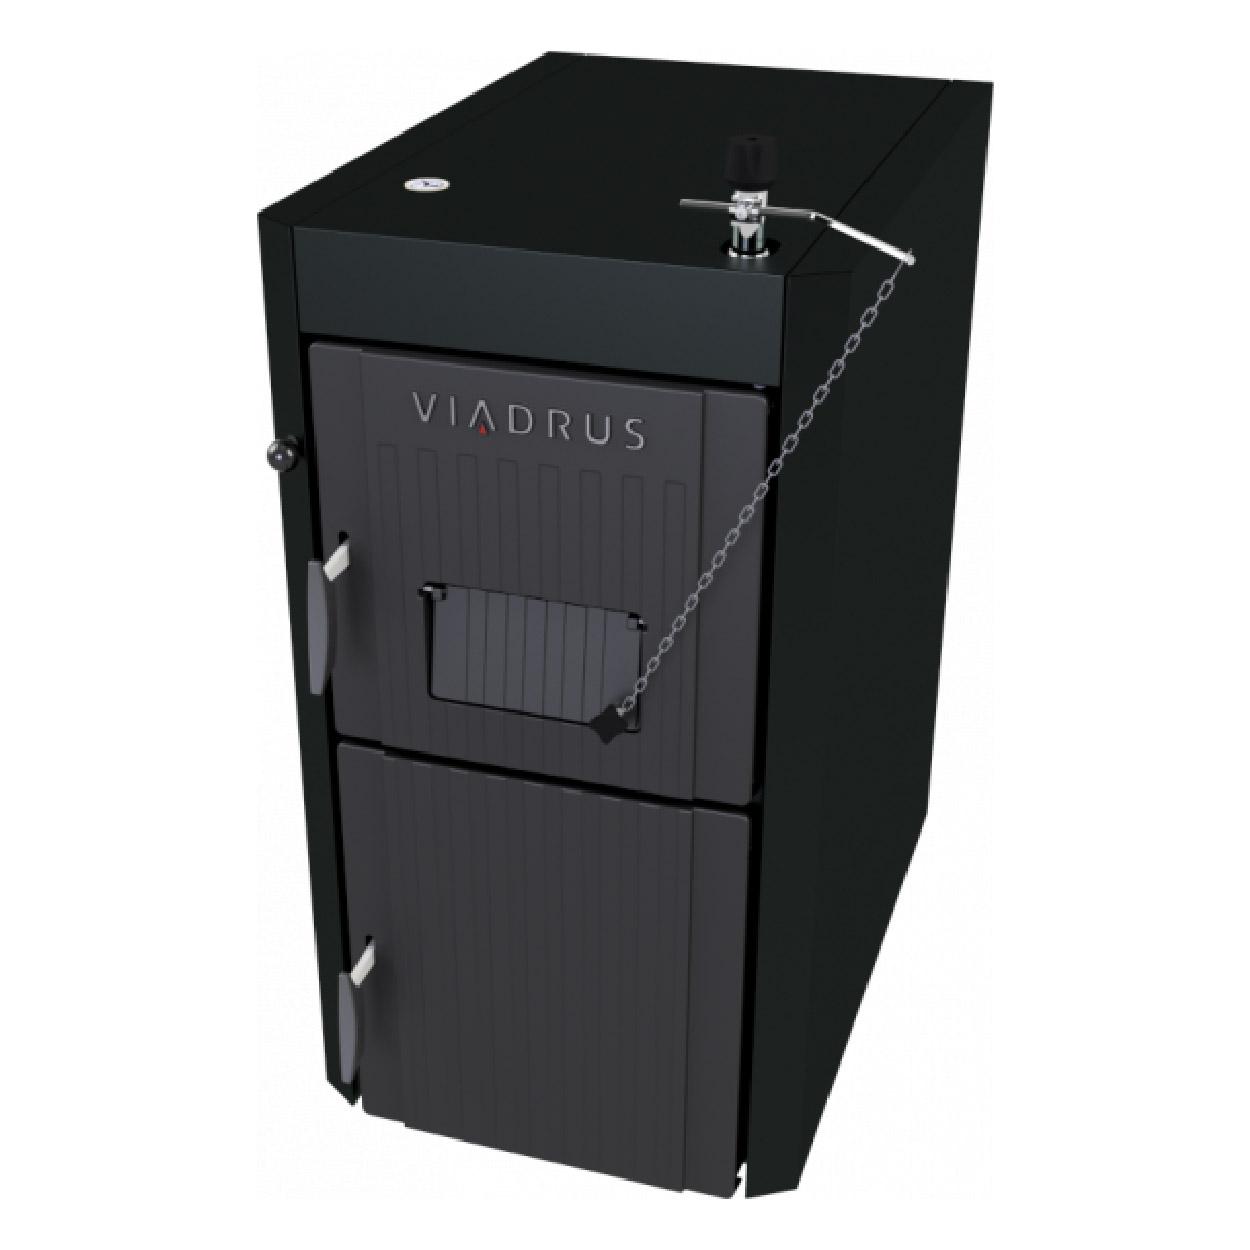 Cazan Viadrus fonta 38 kW U22 Economy fornello imagine